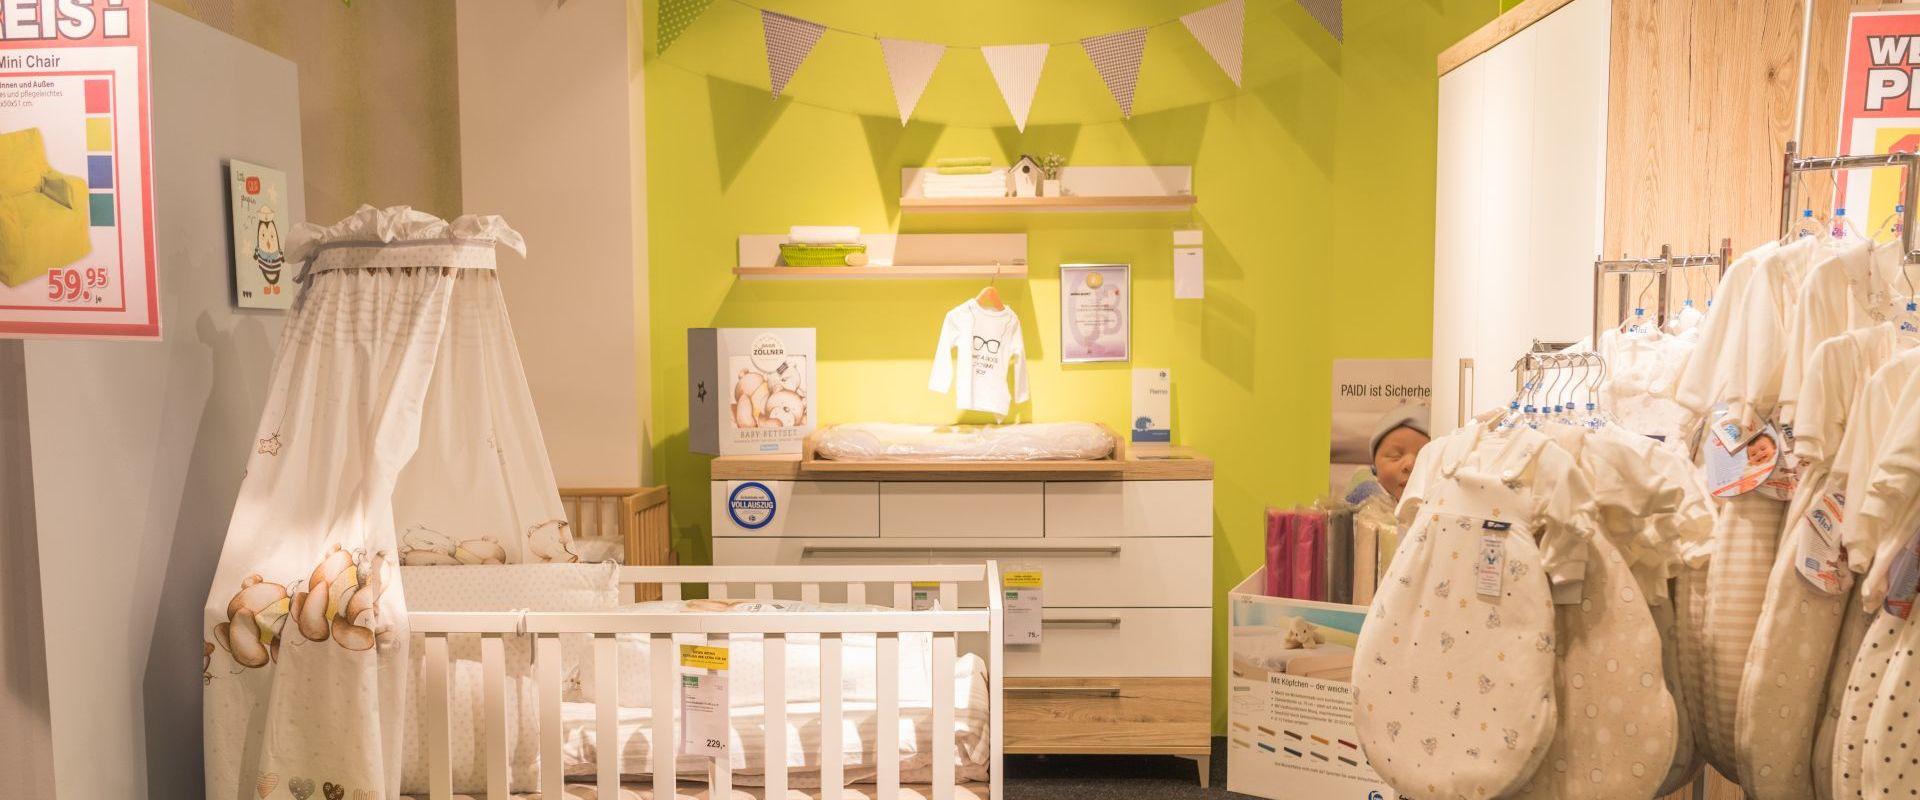 Babymöbel Düsseldorf babymöbel marken design